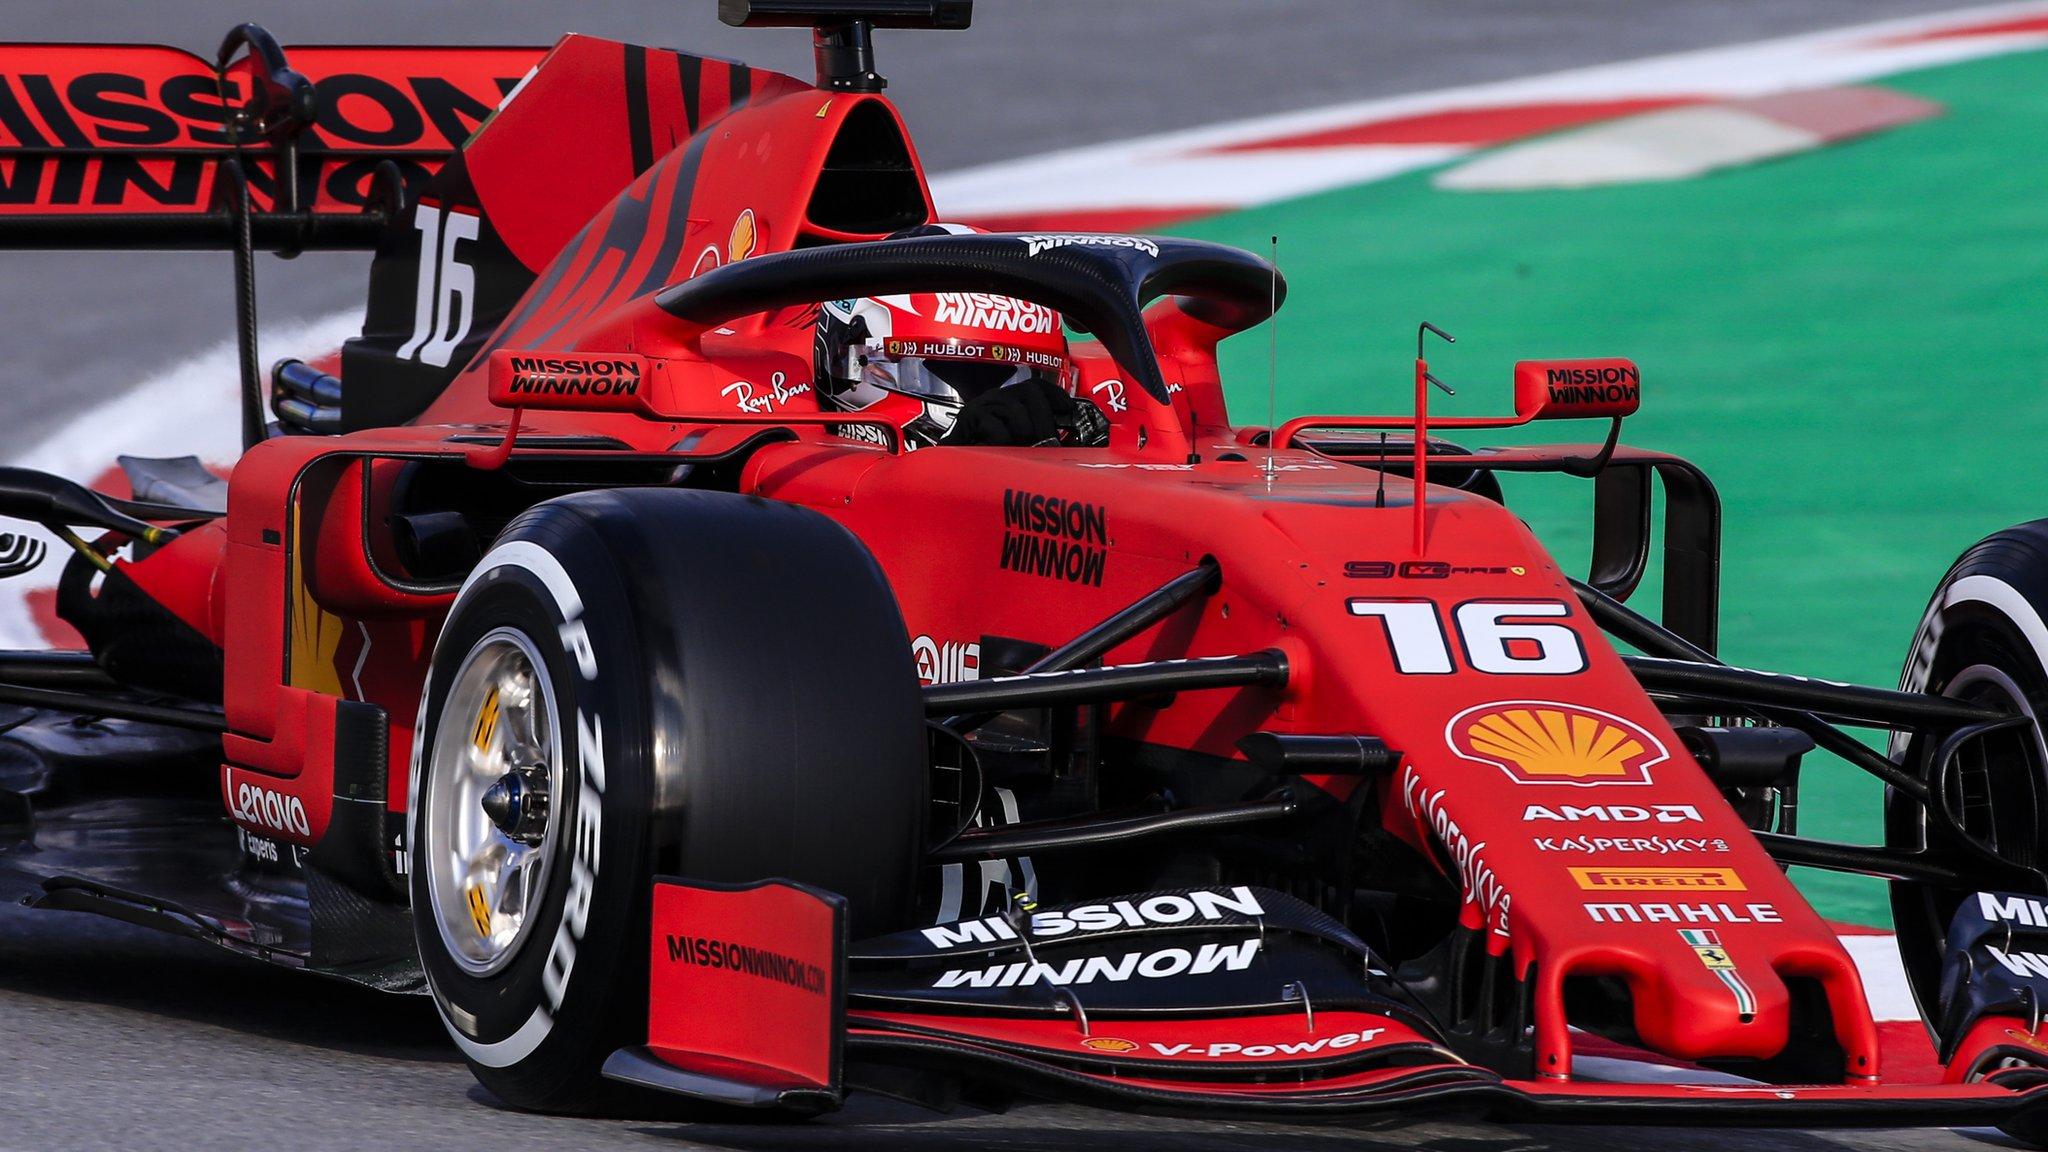 F1 testing: Leclerc fastest for Ferrari in Barcelona